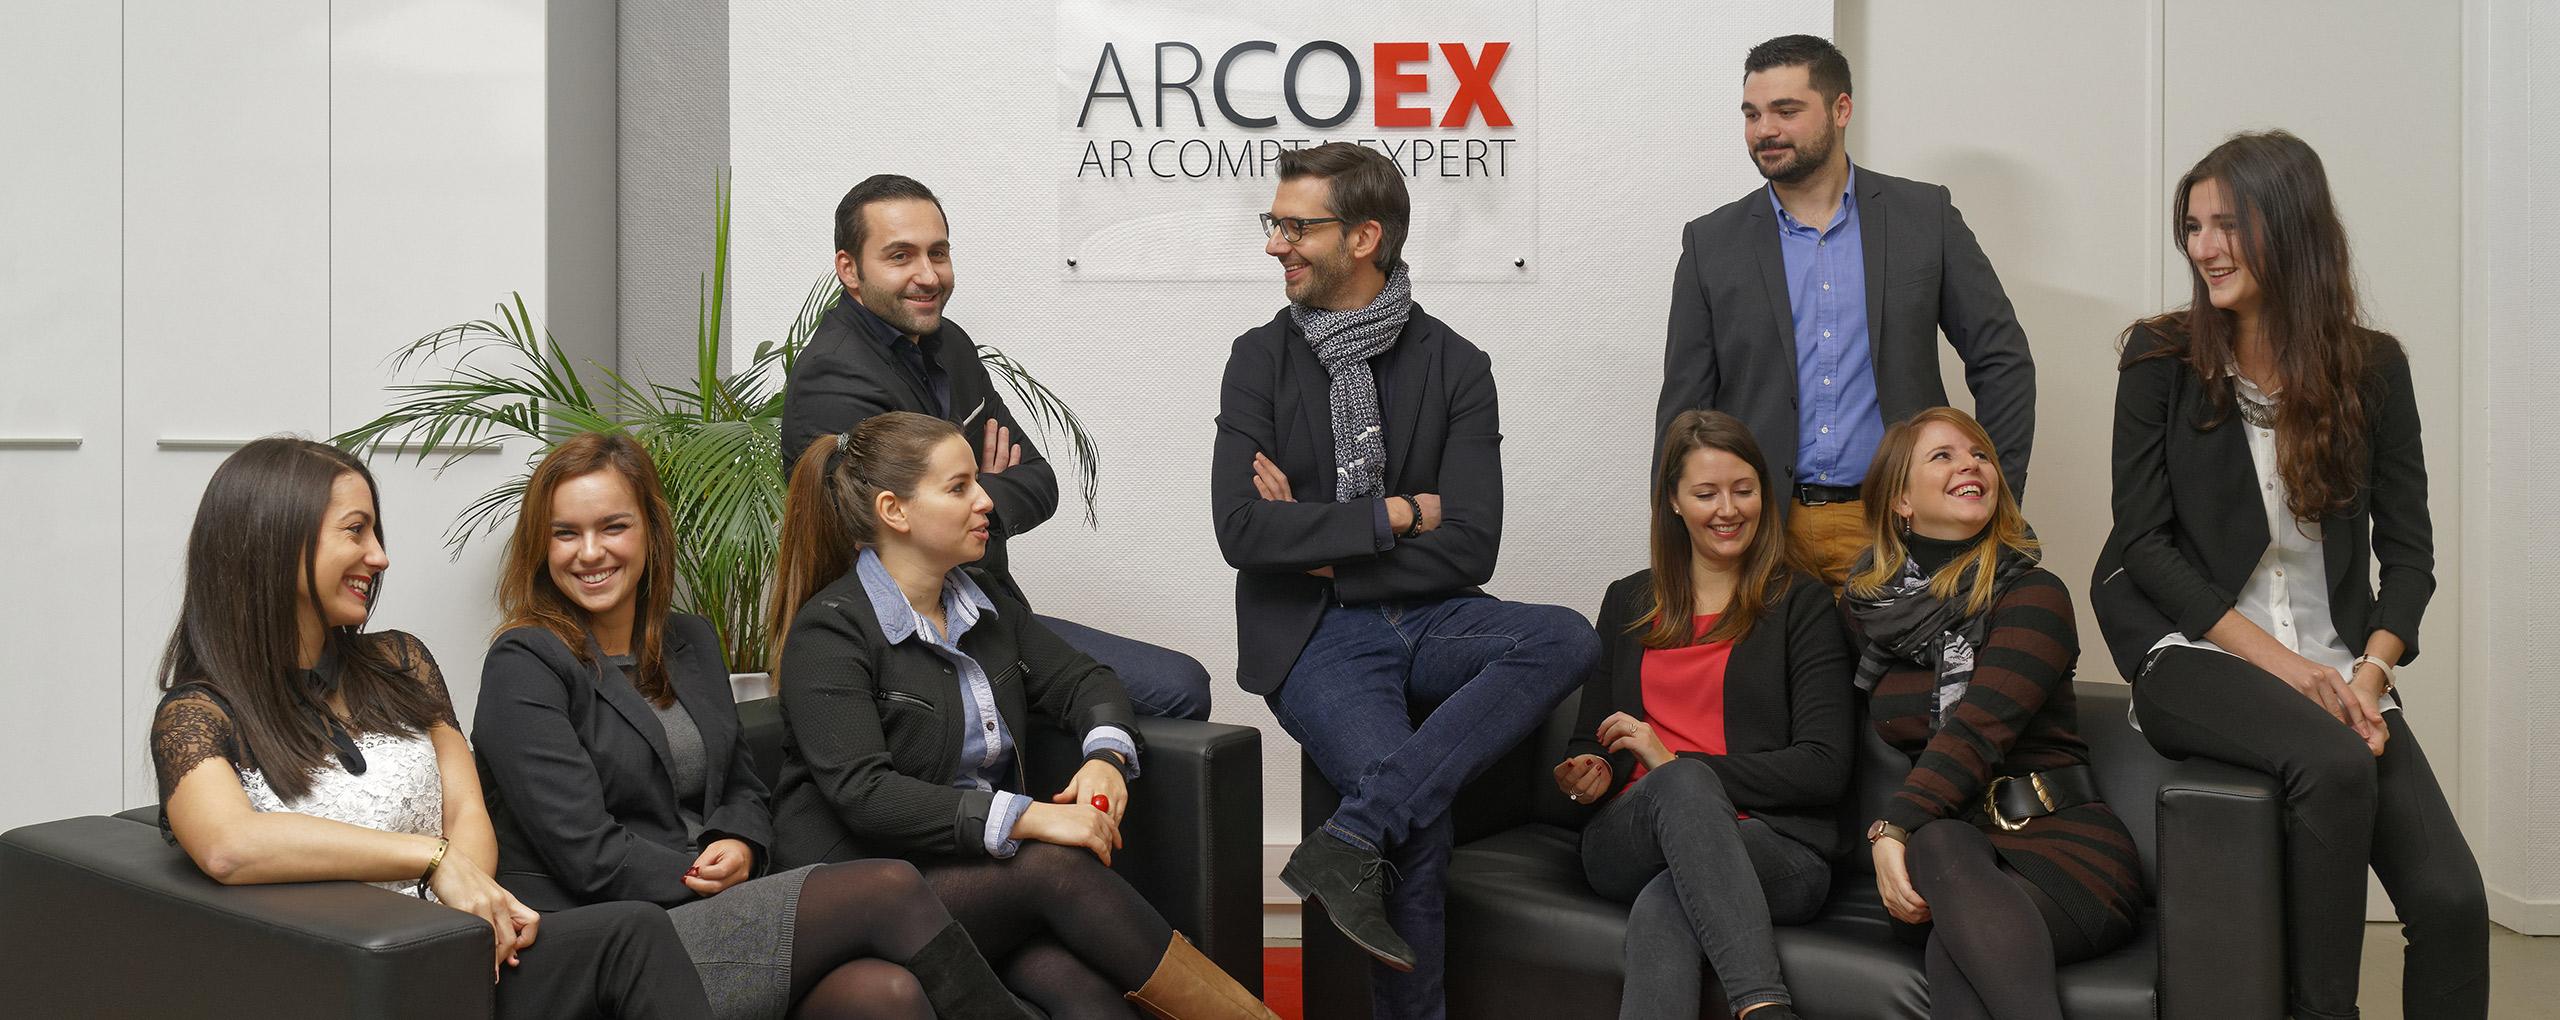 Equipe Arcoex